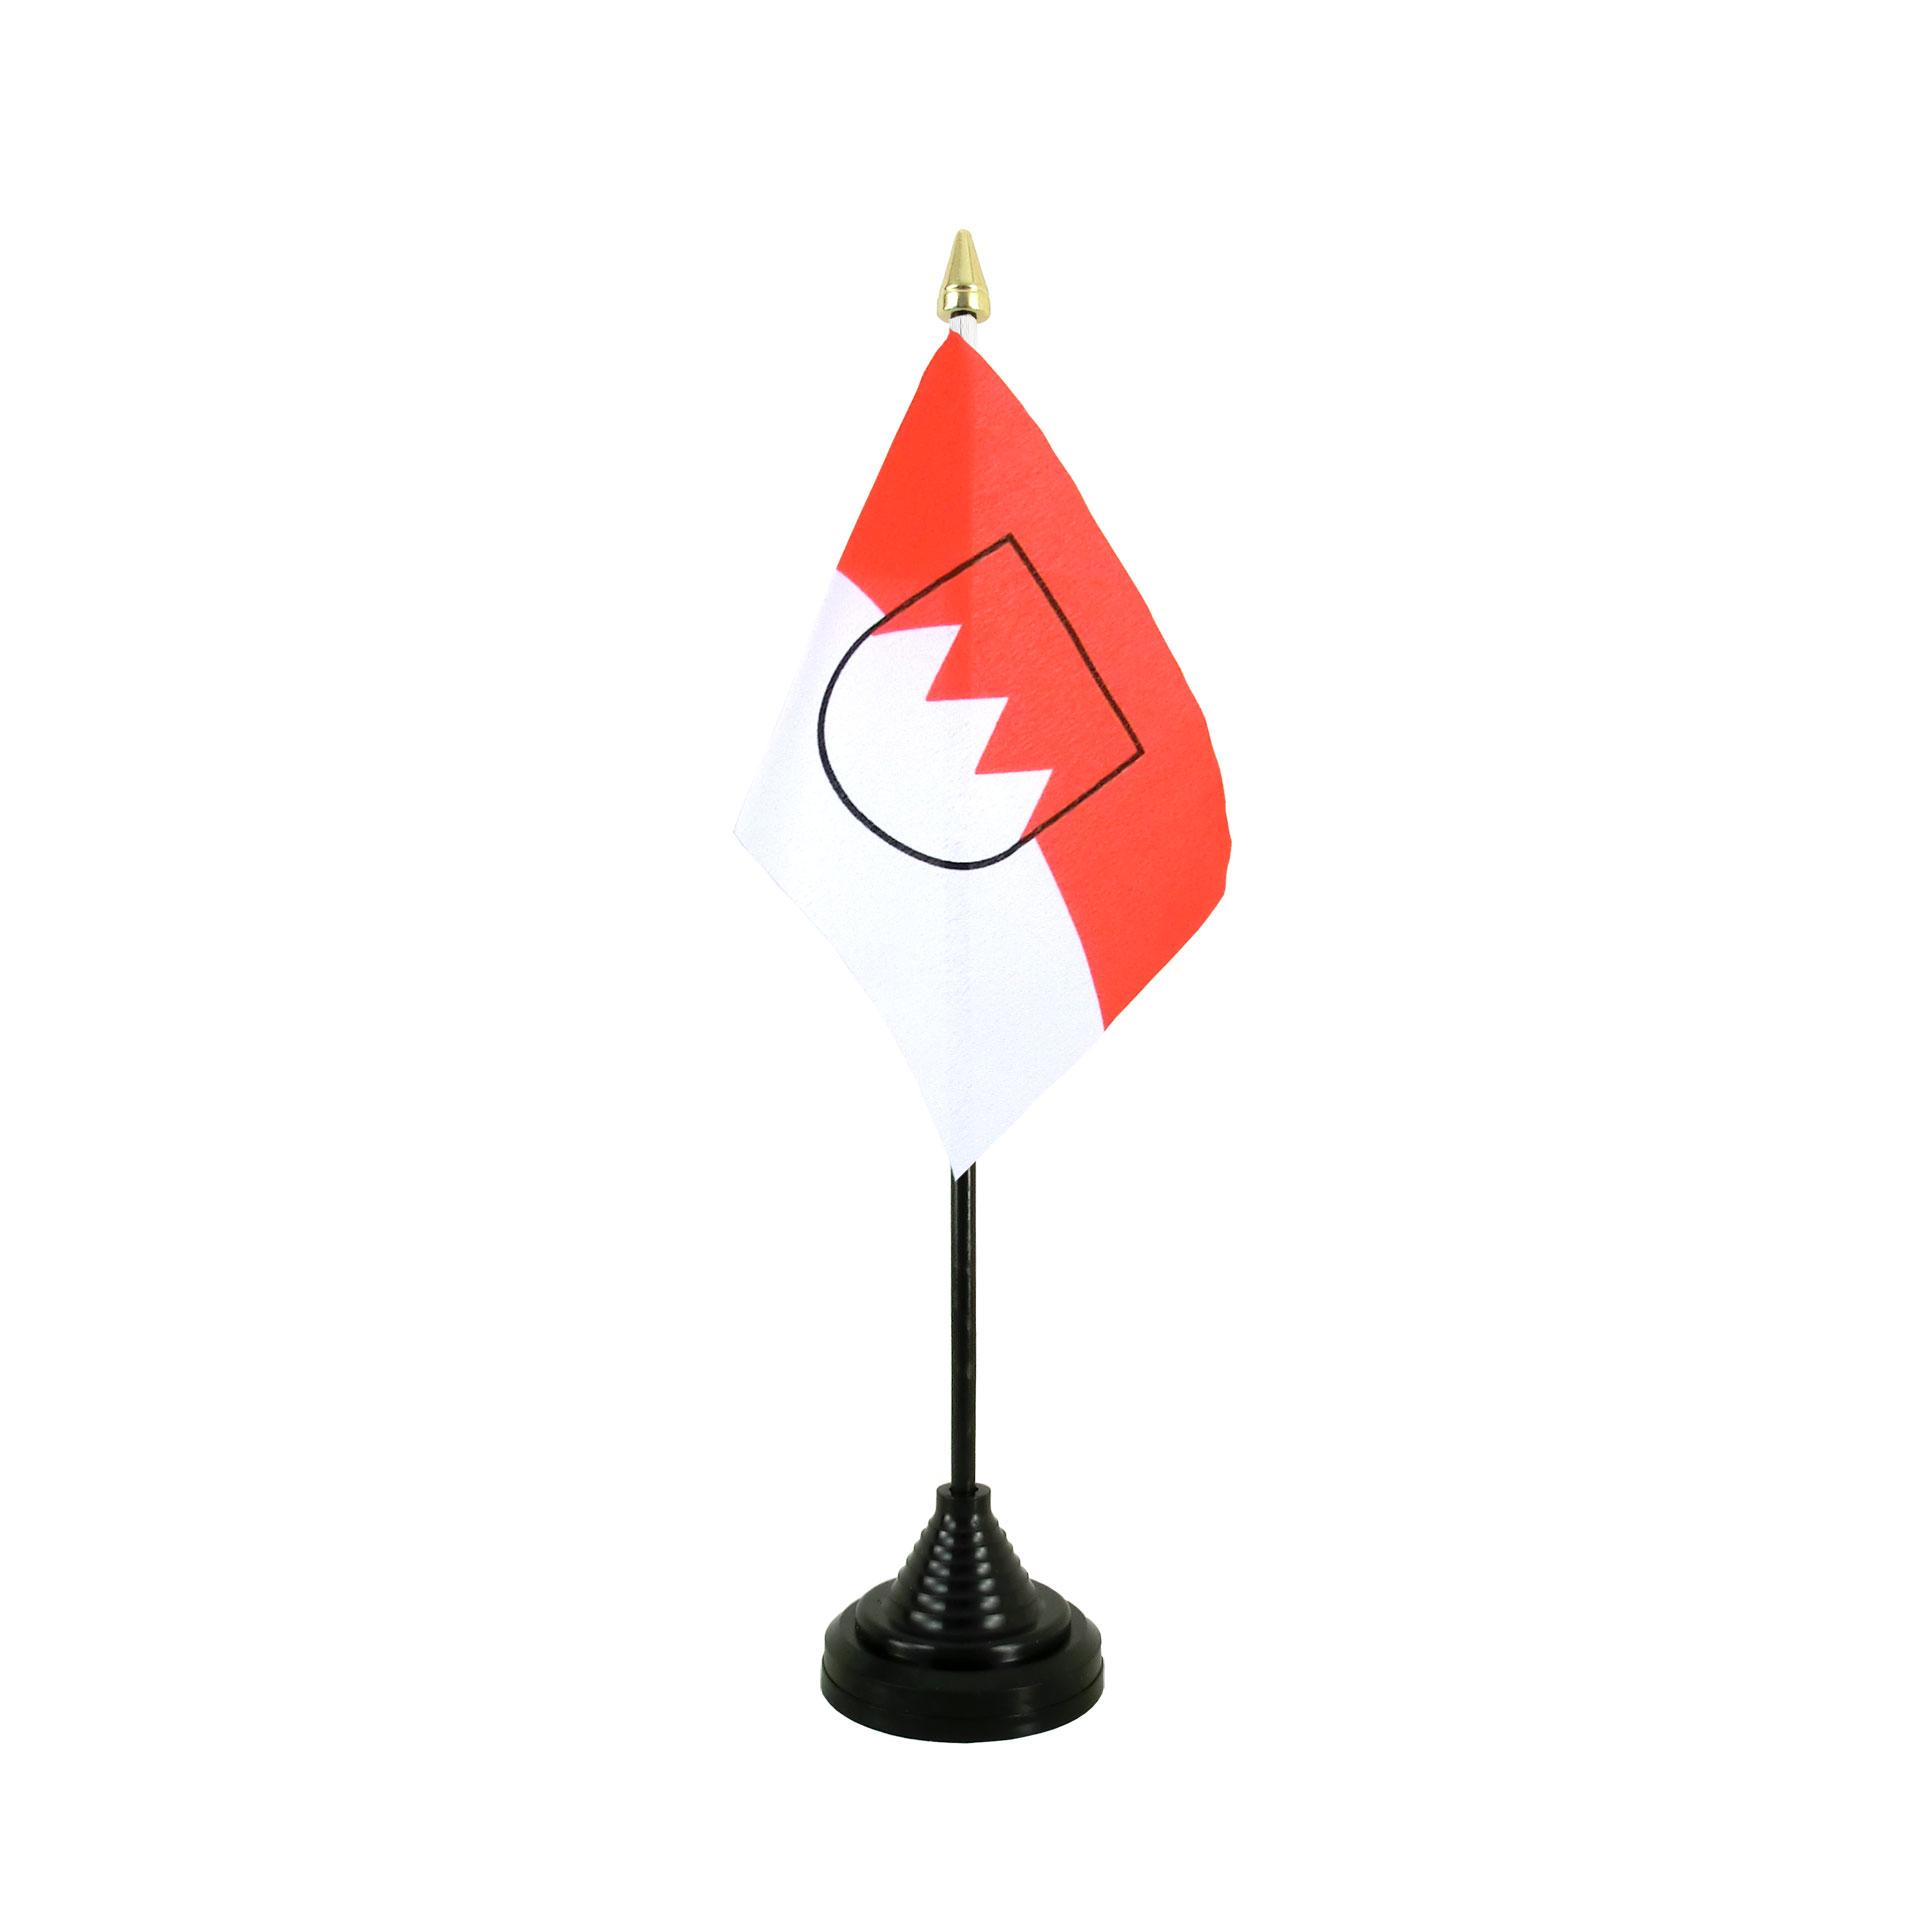 Franken Tischflagge Tischfahne Flagge Memorabilia Flaggen